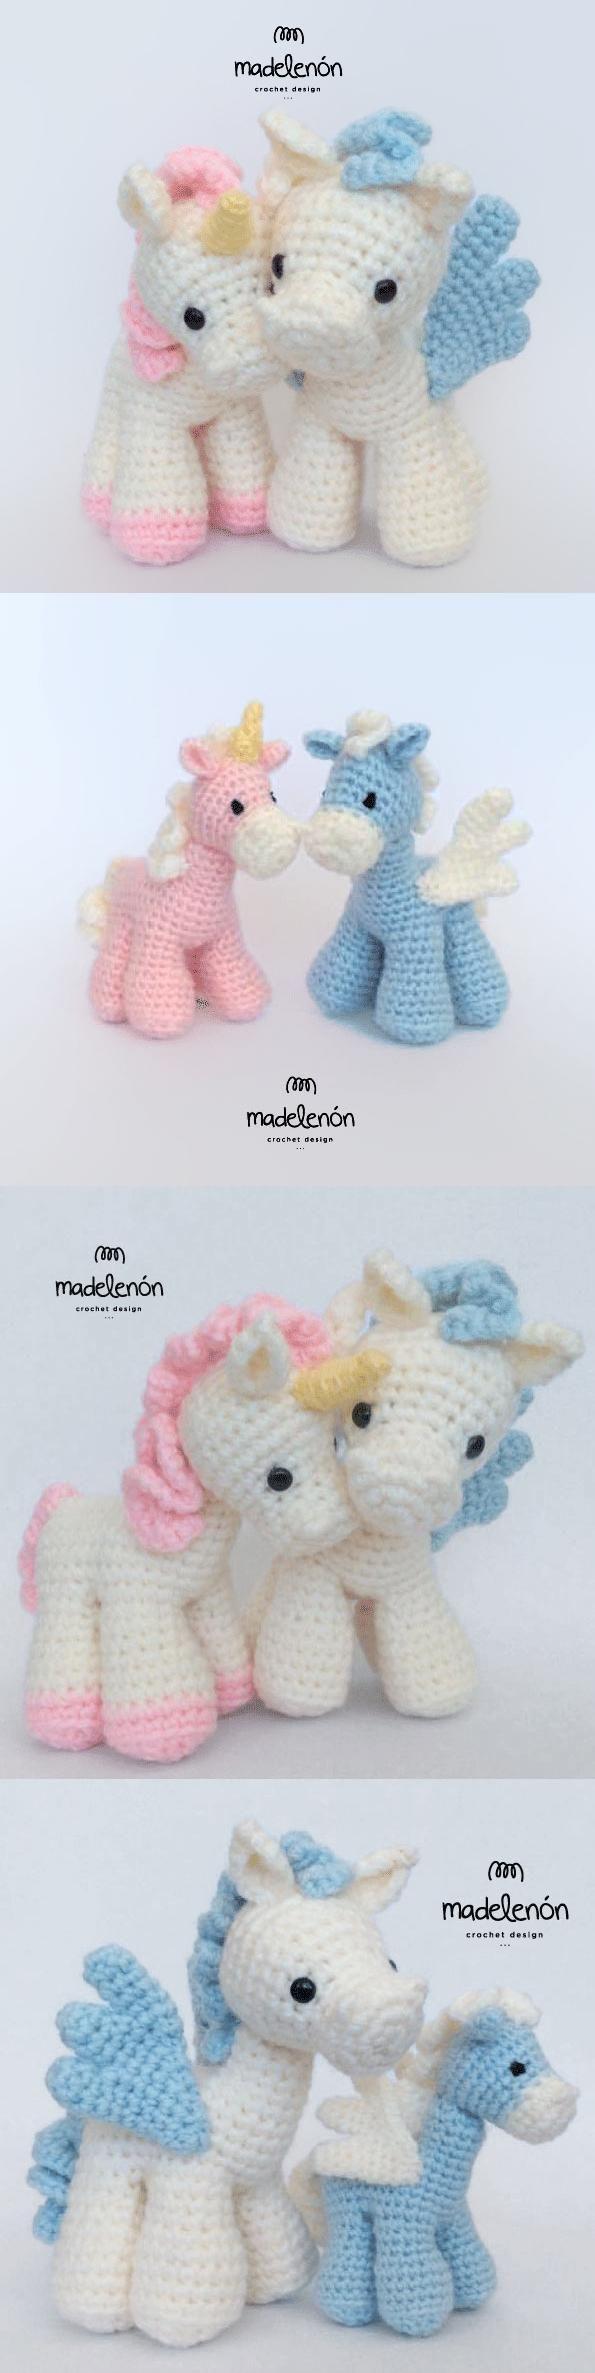 Fantasy amigurumi pattern by Madelenon | Unicornio, Tejido y ...